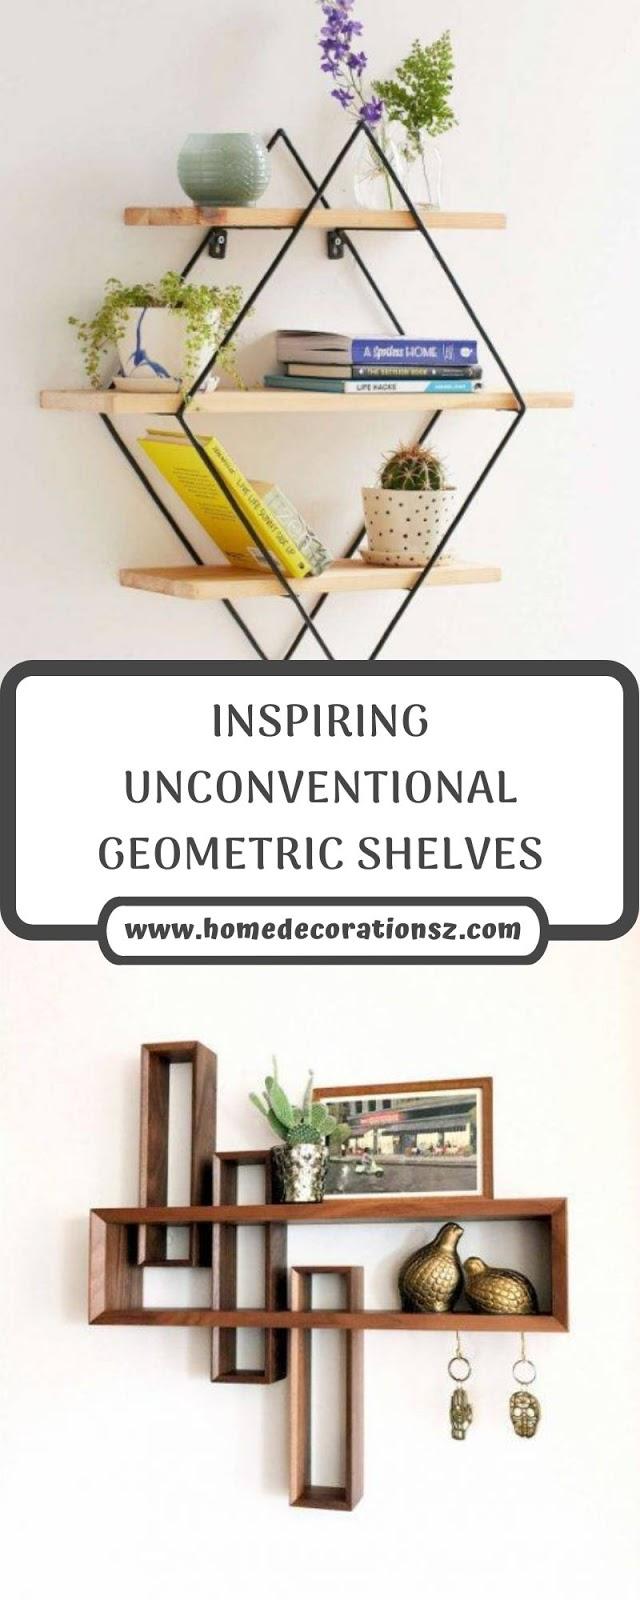 INSPIRING UNCONVENTIONAL GEOMETRIC SHELVES